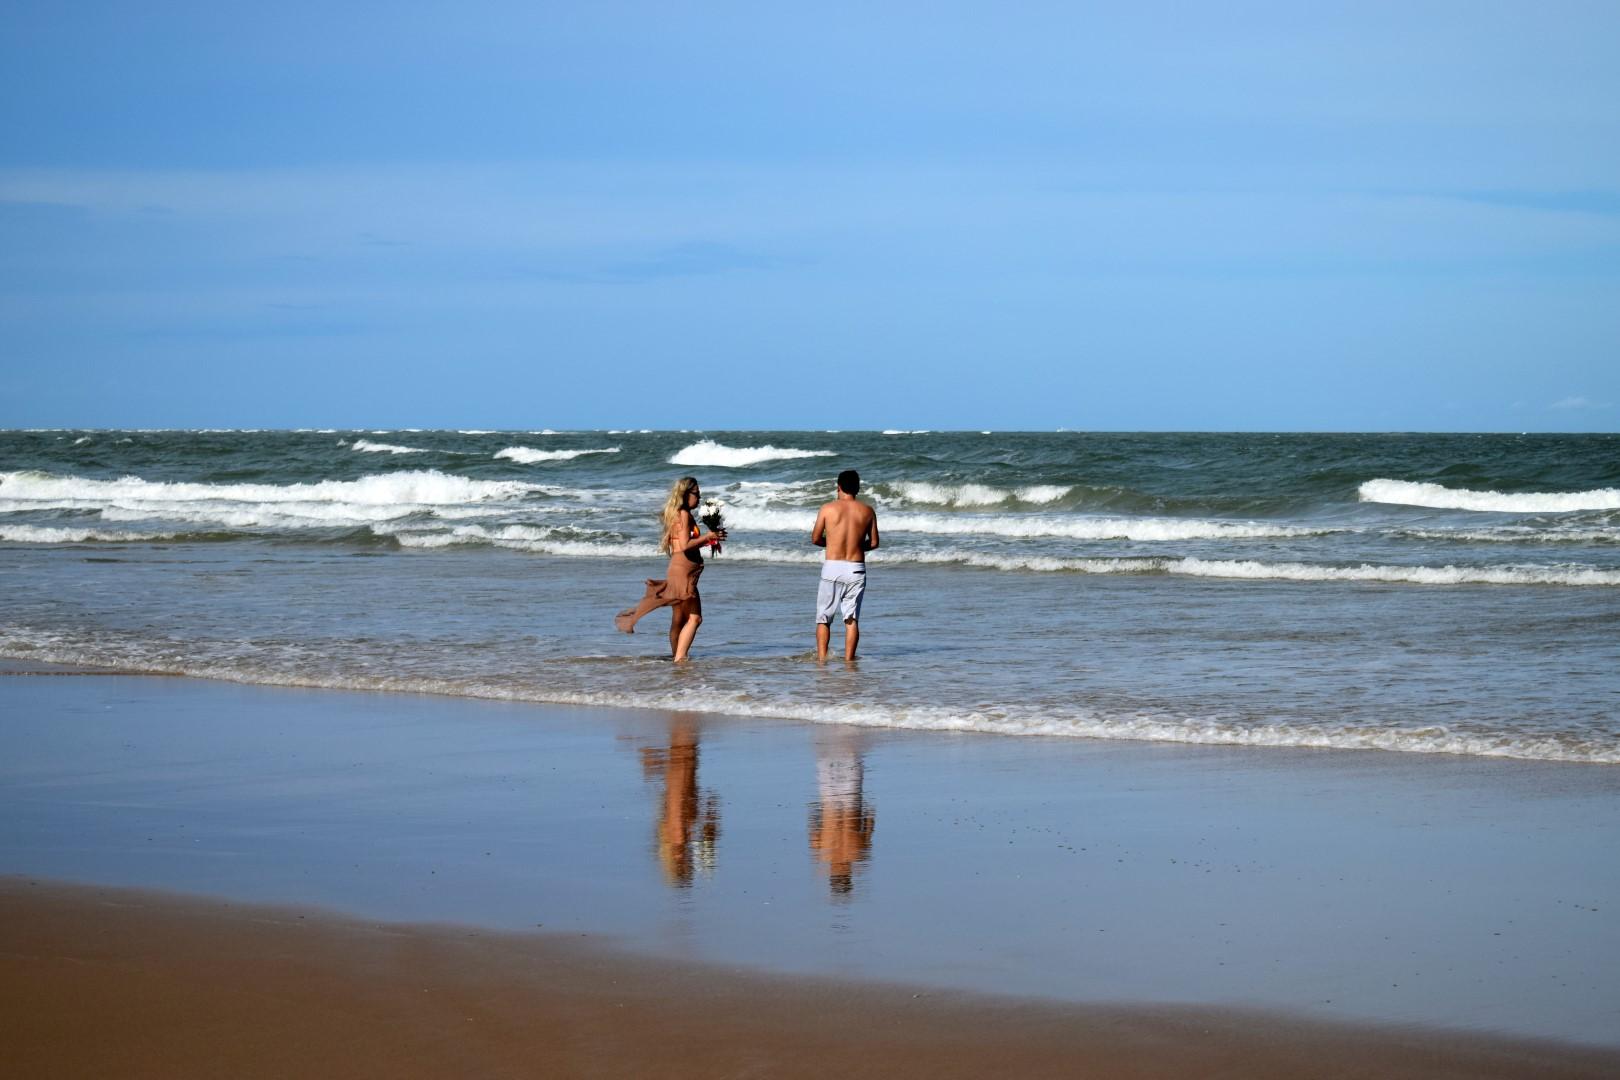 Dia de Iemanjá, Praia de Atalaia, Aracaju